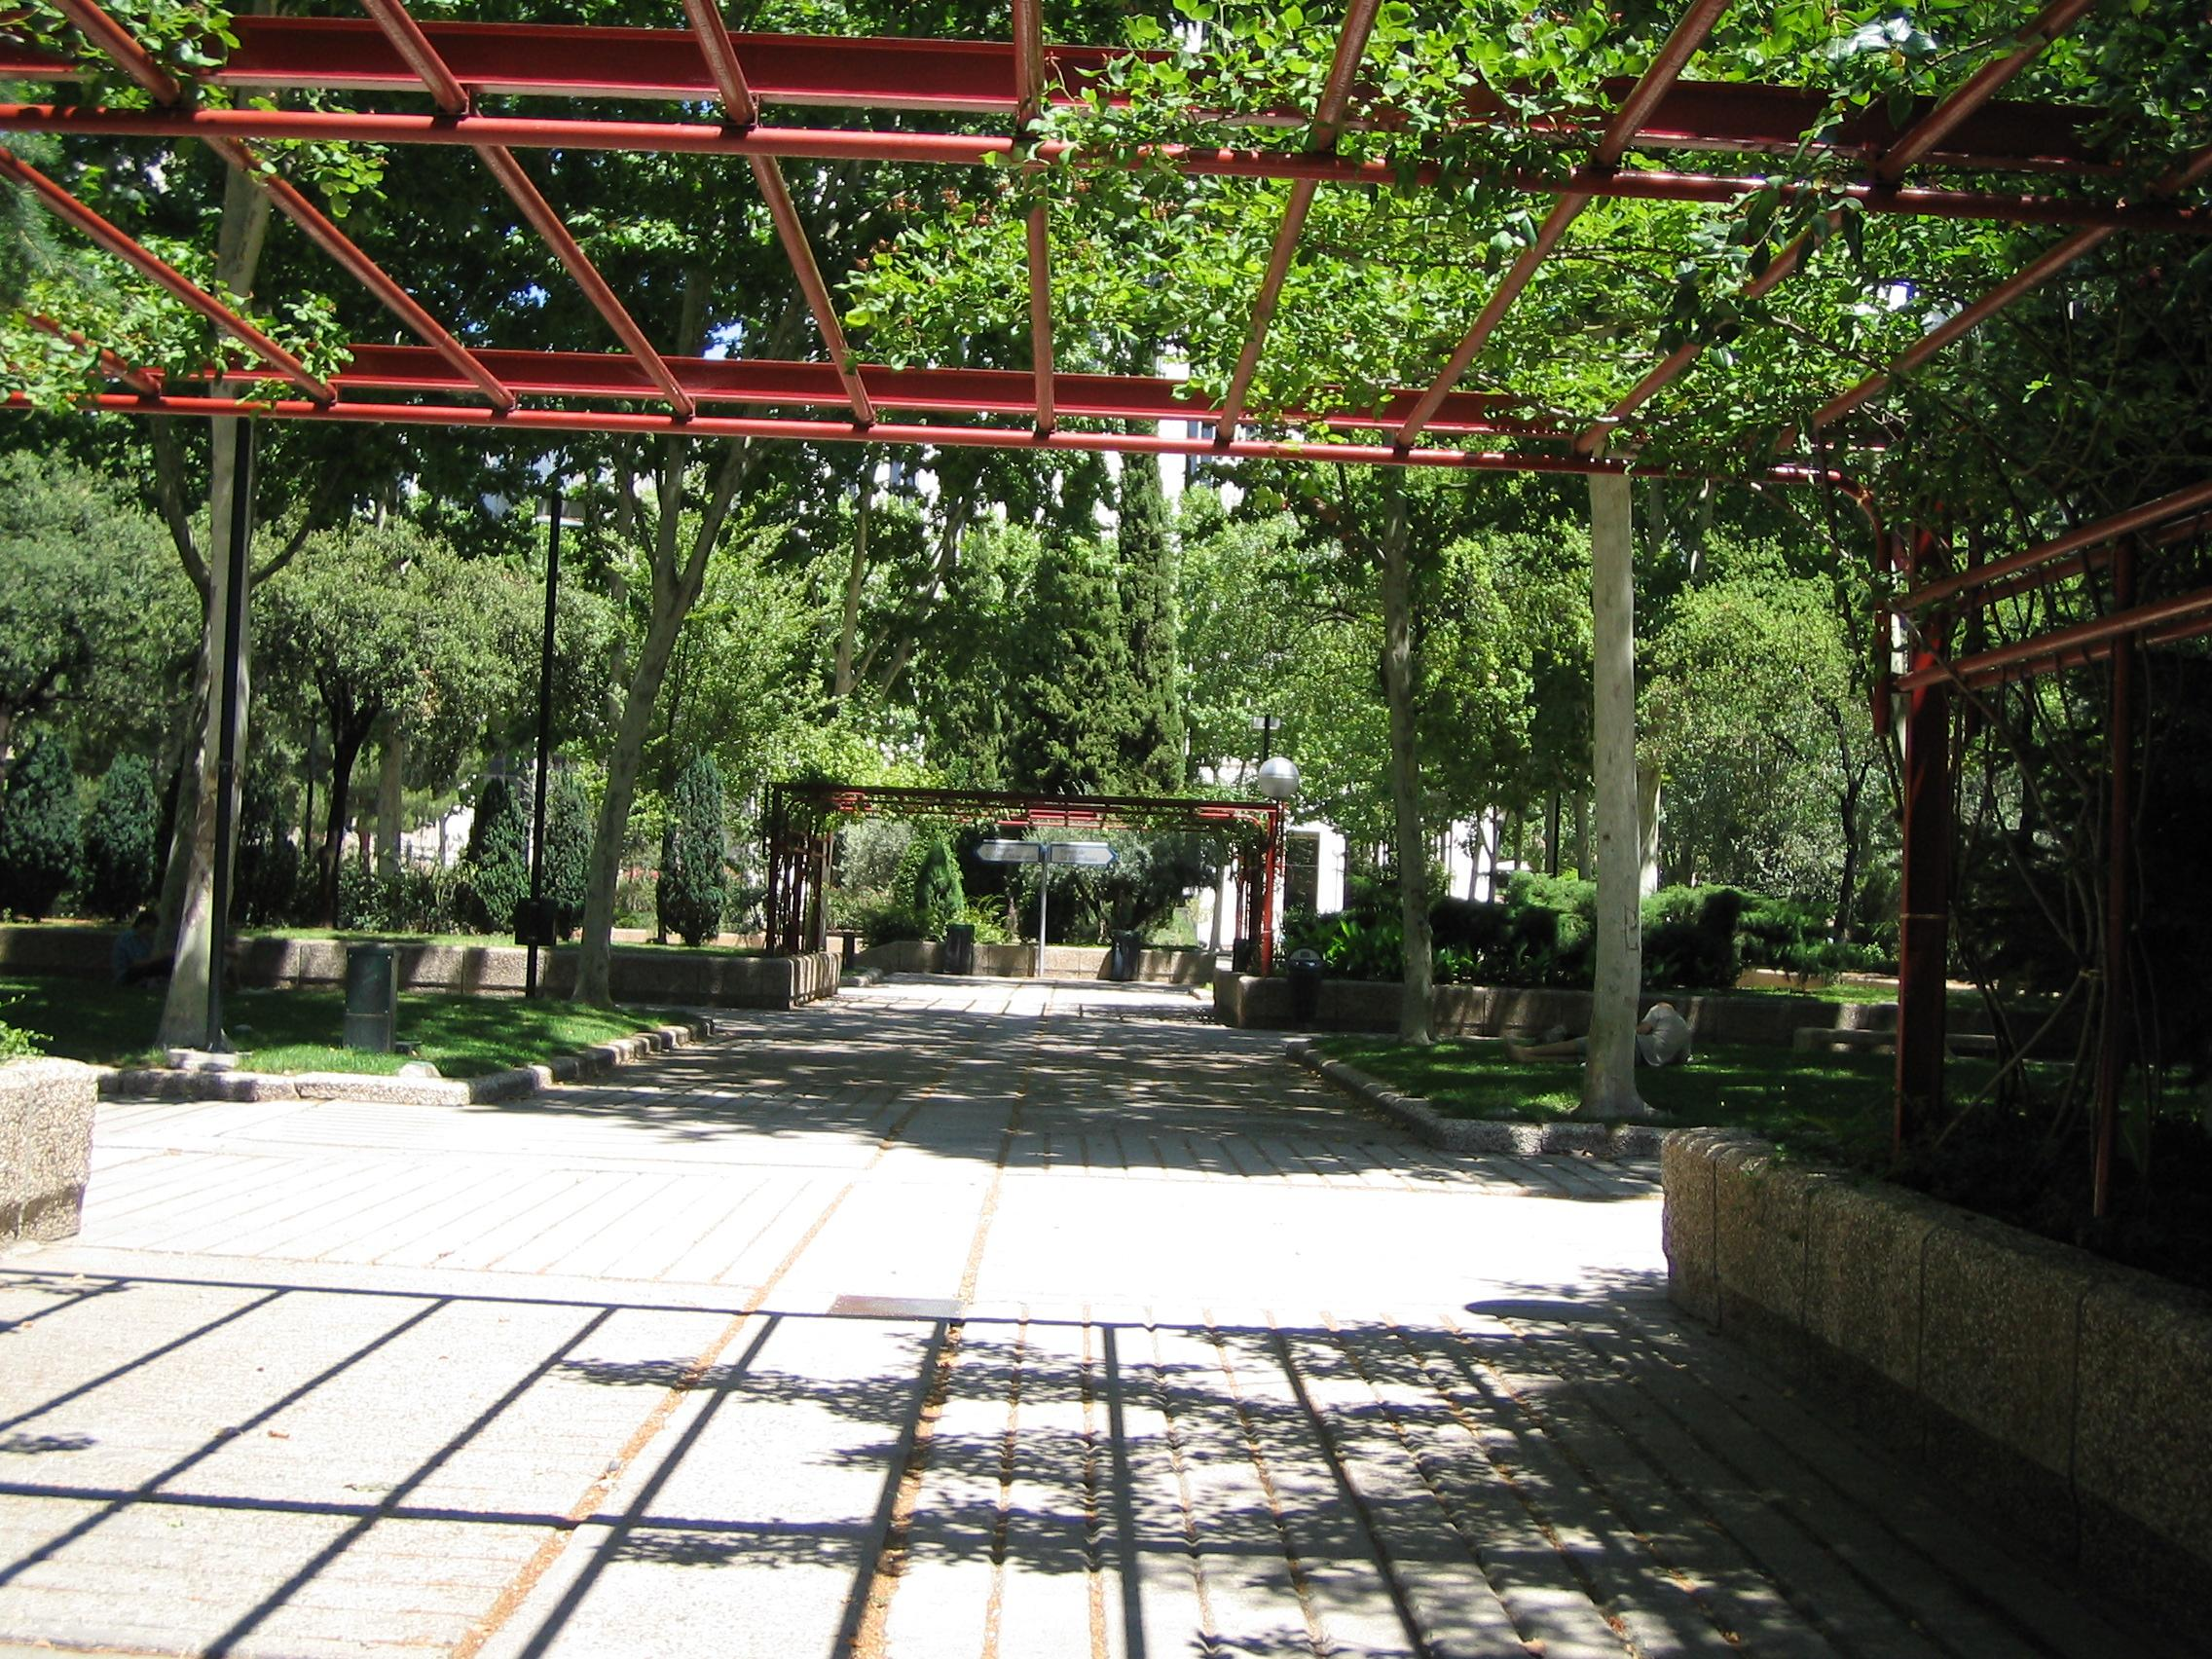 File:Jardines de AZCA (Madrid).jpg - Wikimedia Commons